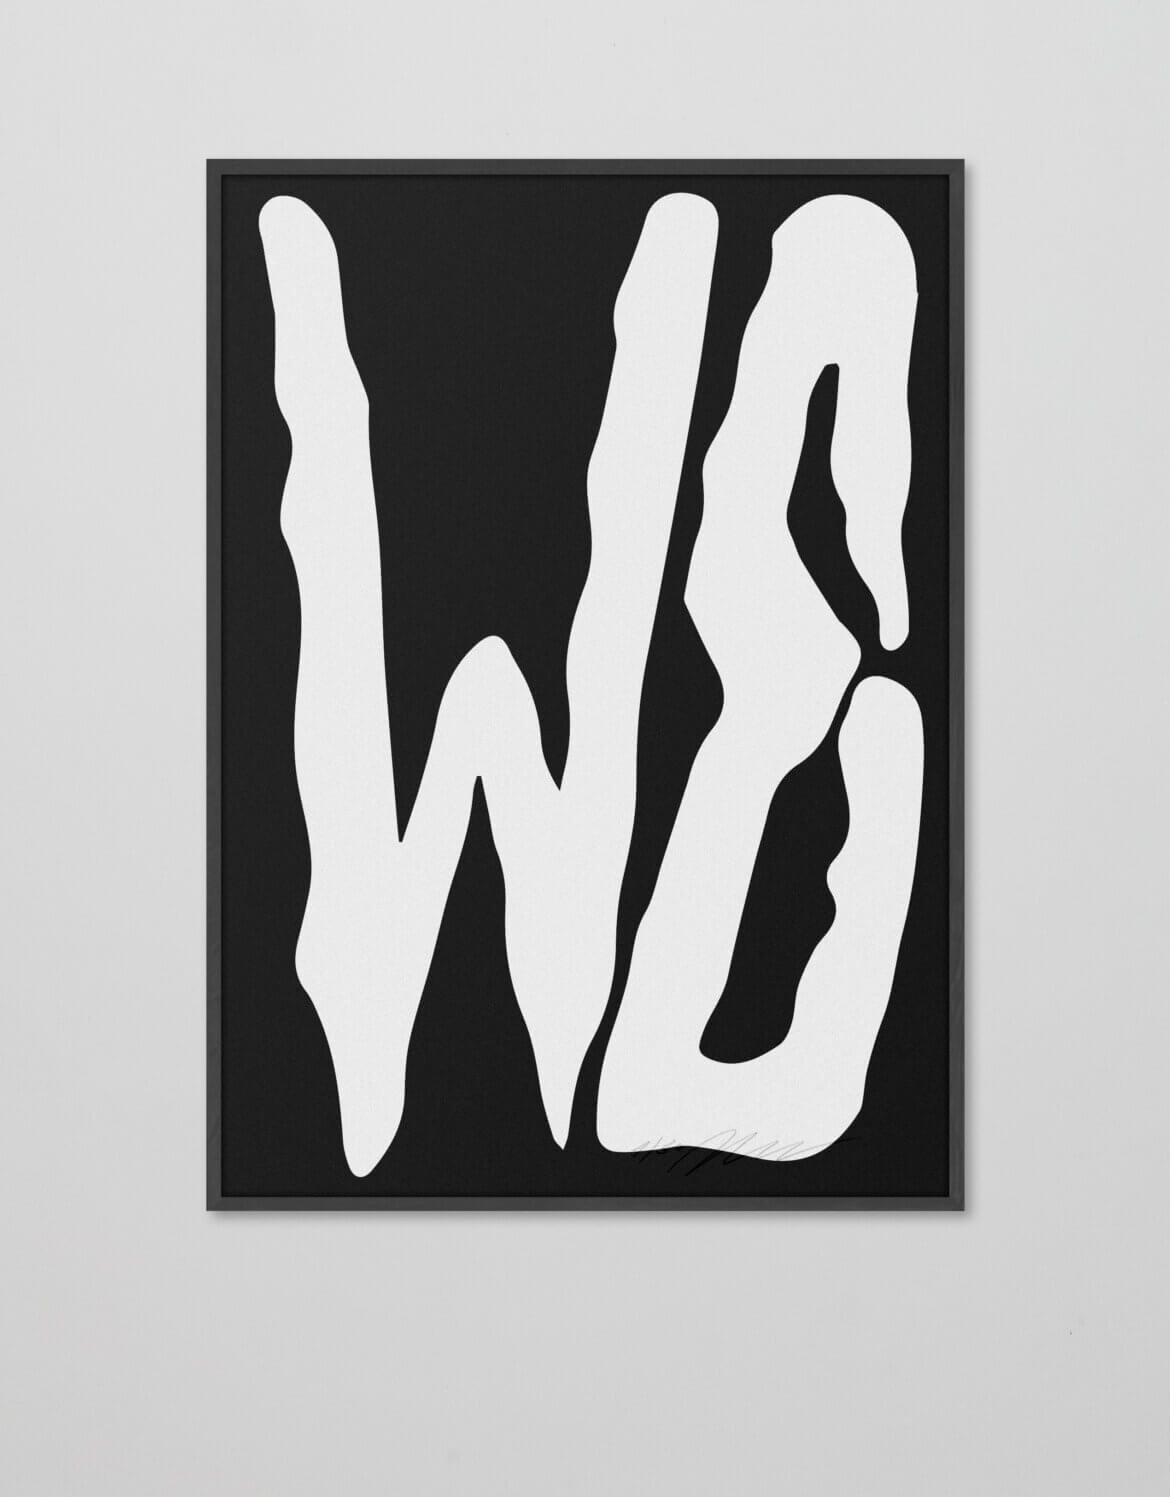 WE |Plakat | Angermann |Köln | Typografie